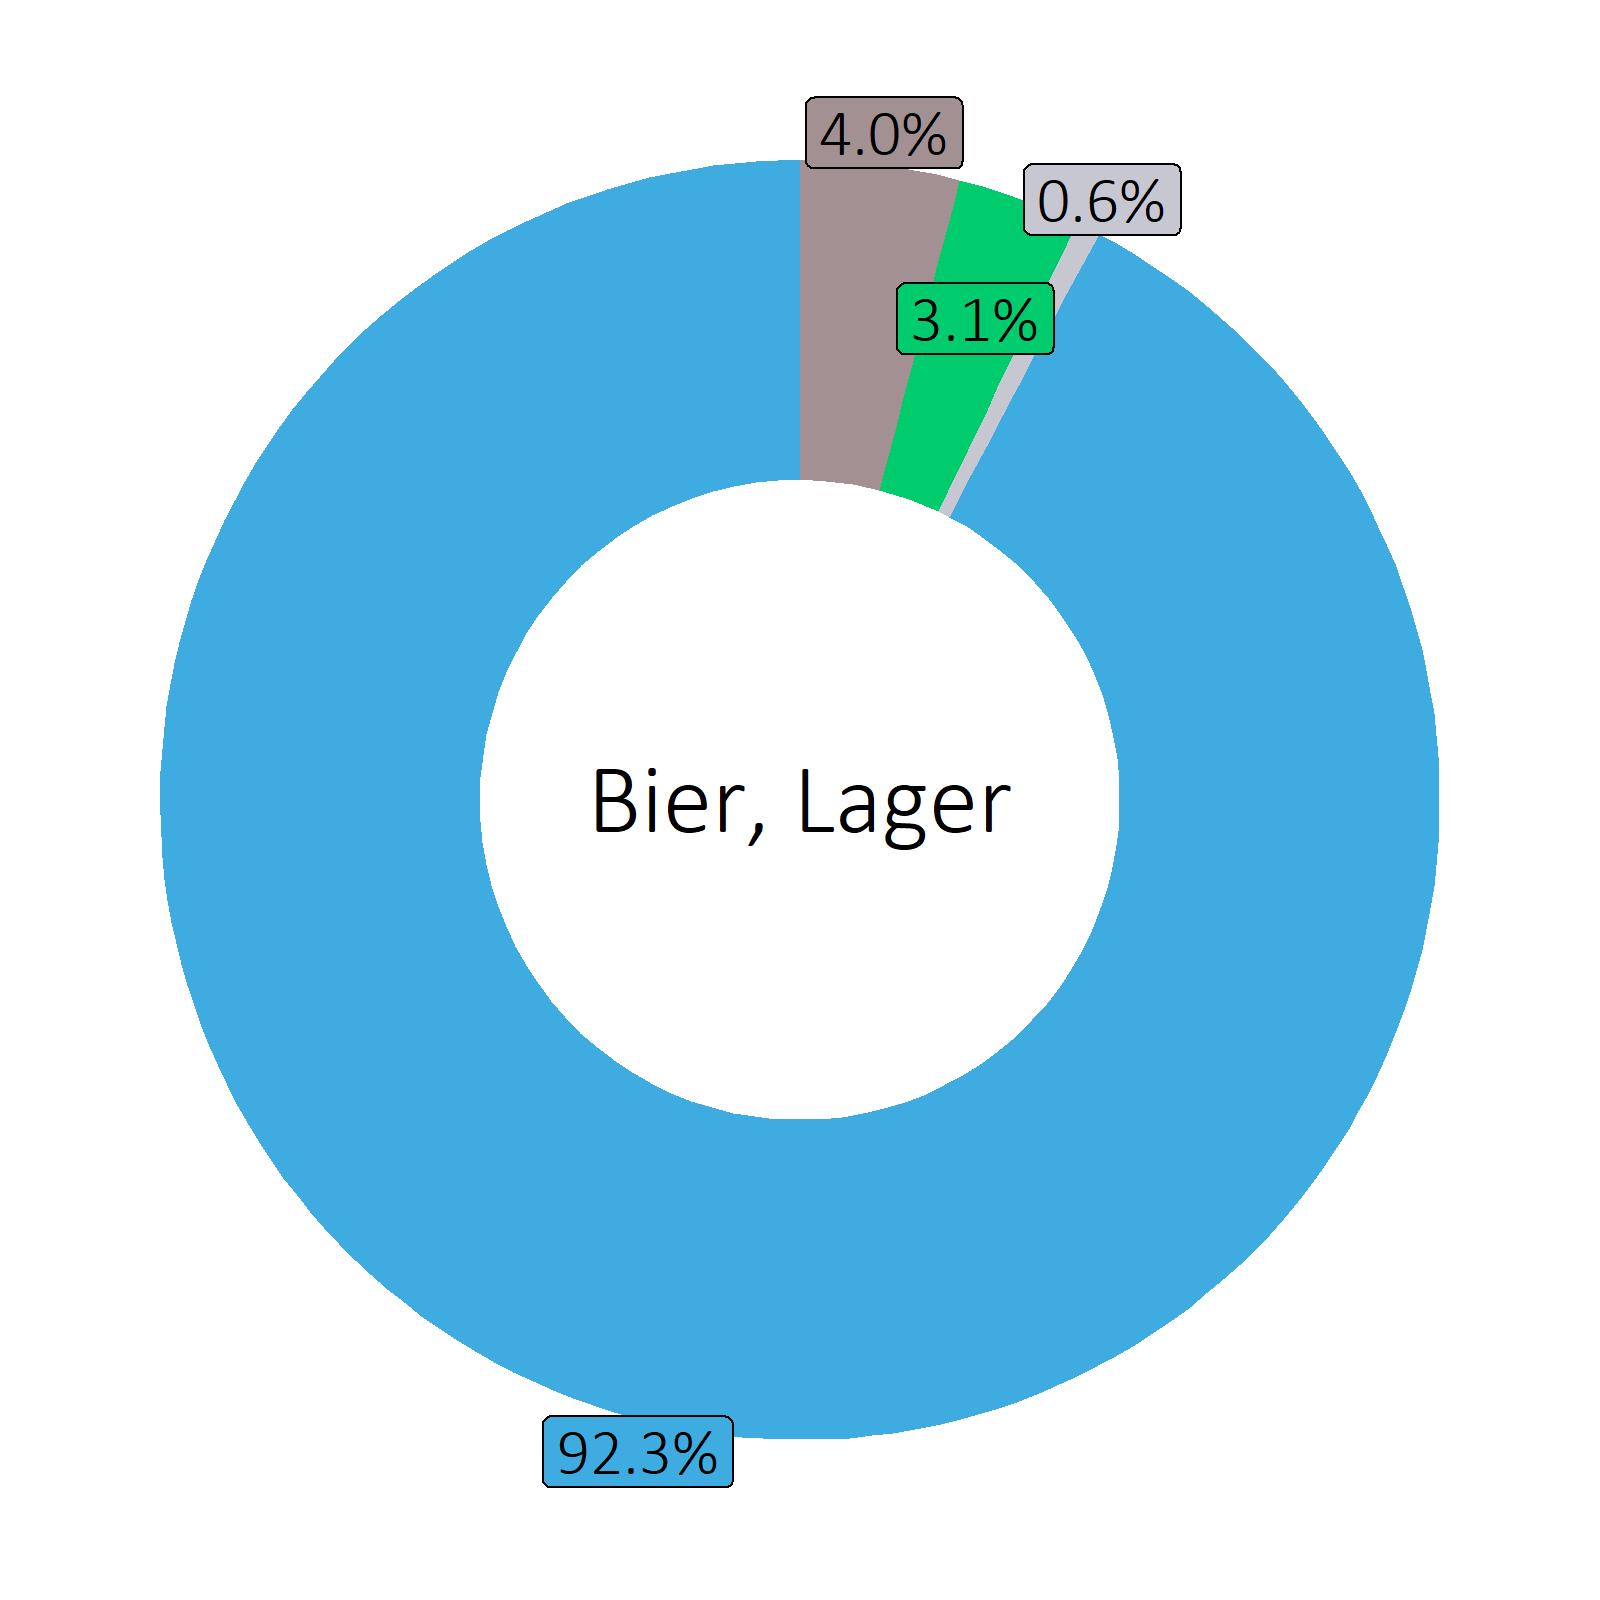 Bestandteile Bier, Lager